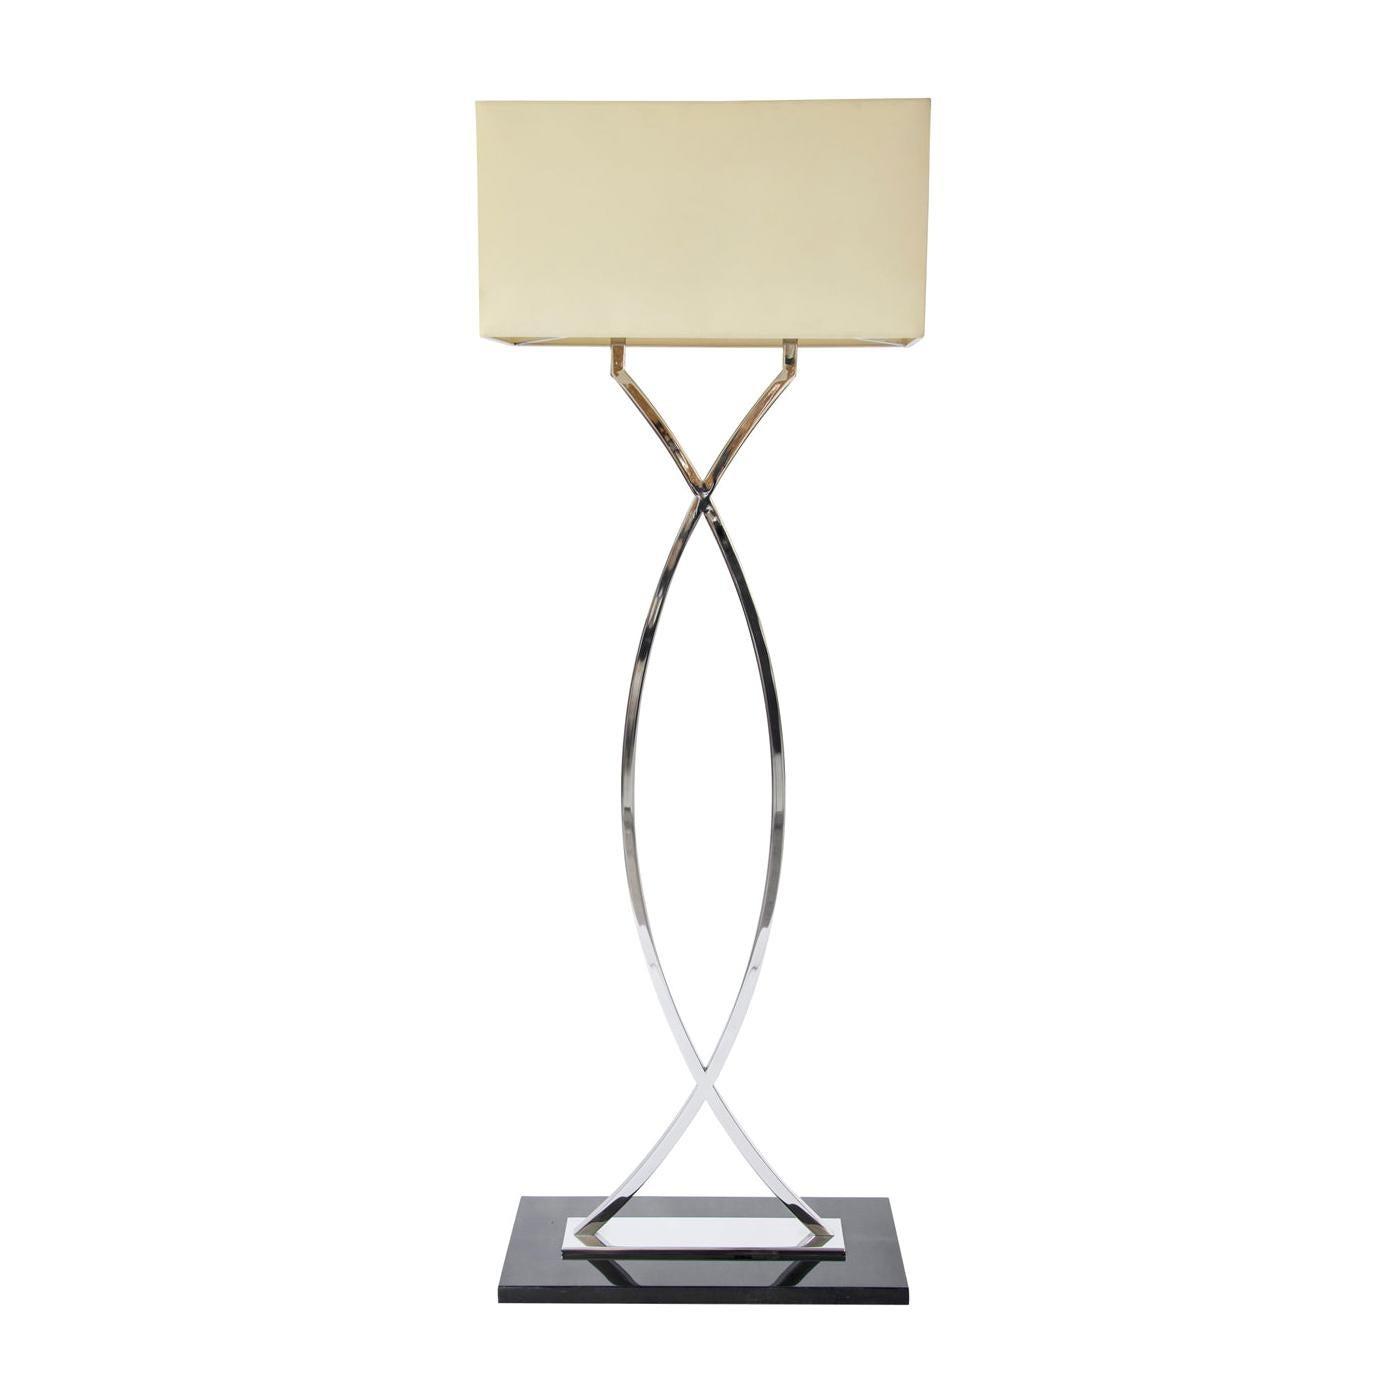 Gamma Stainless Steel Floor Lamp